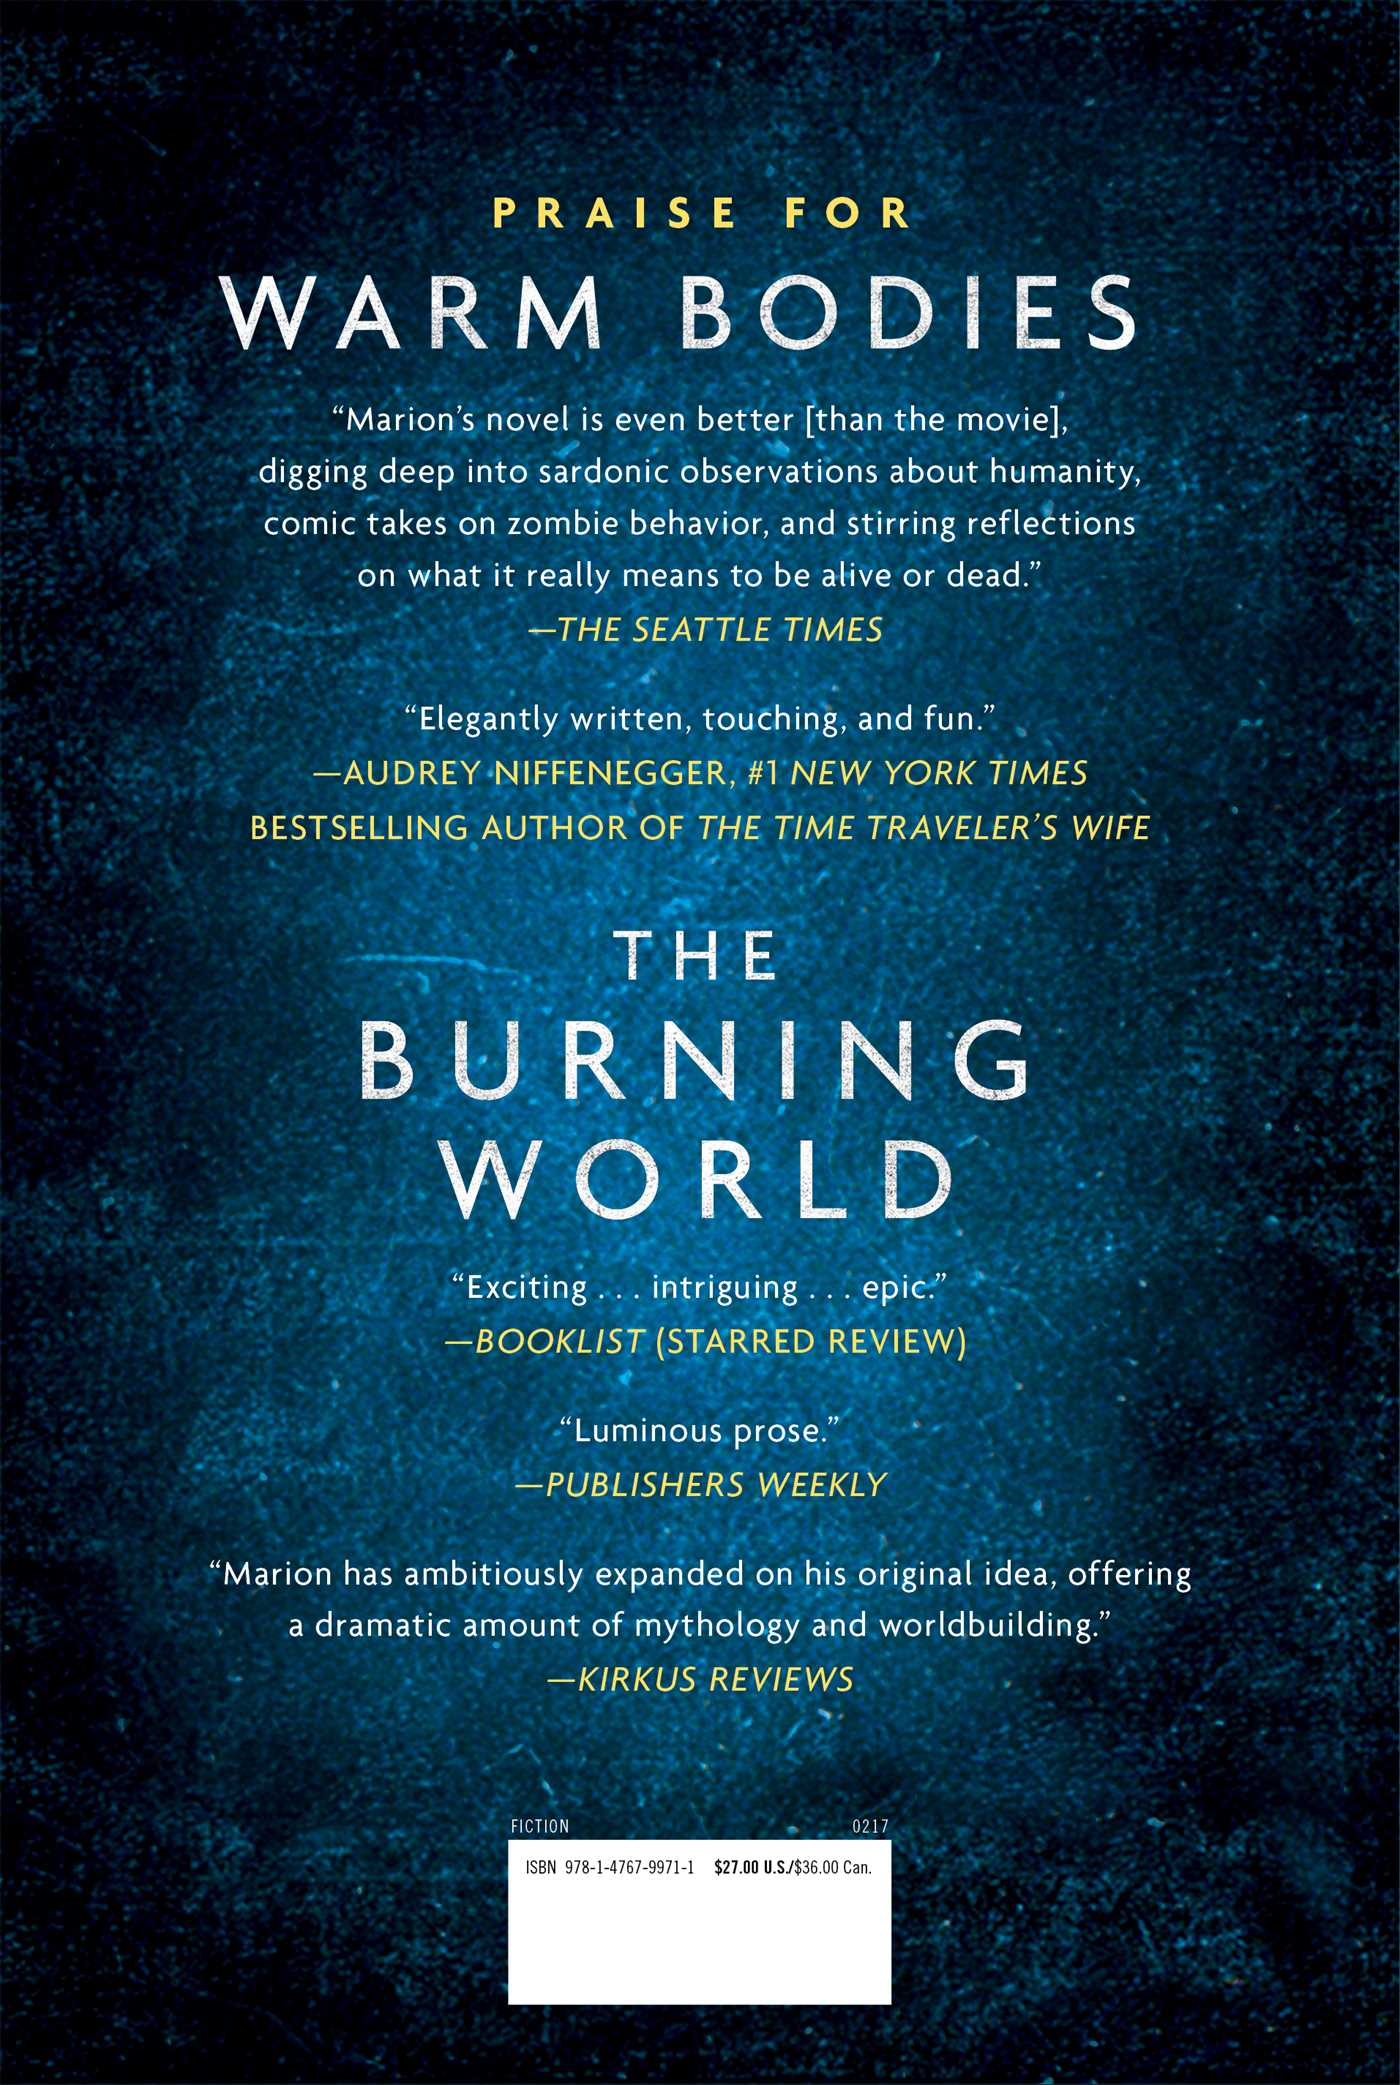 The burning world 9781476799711 hr back